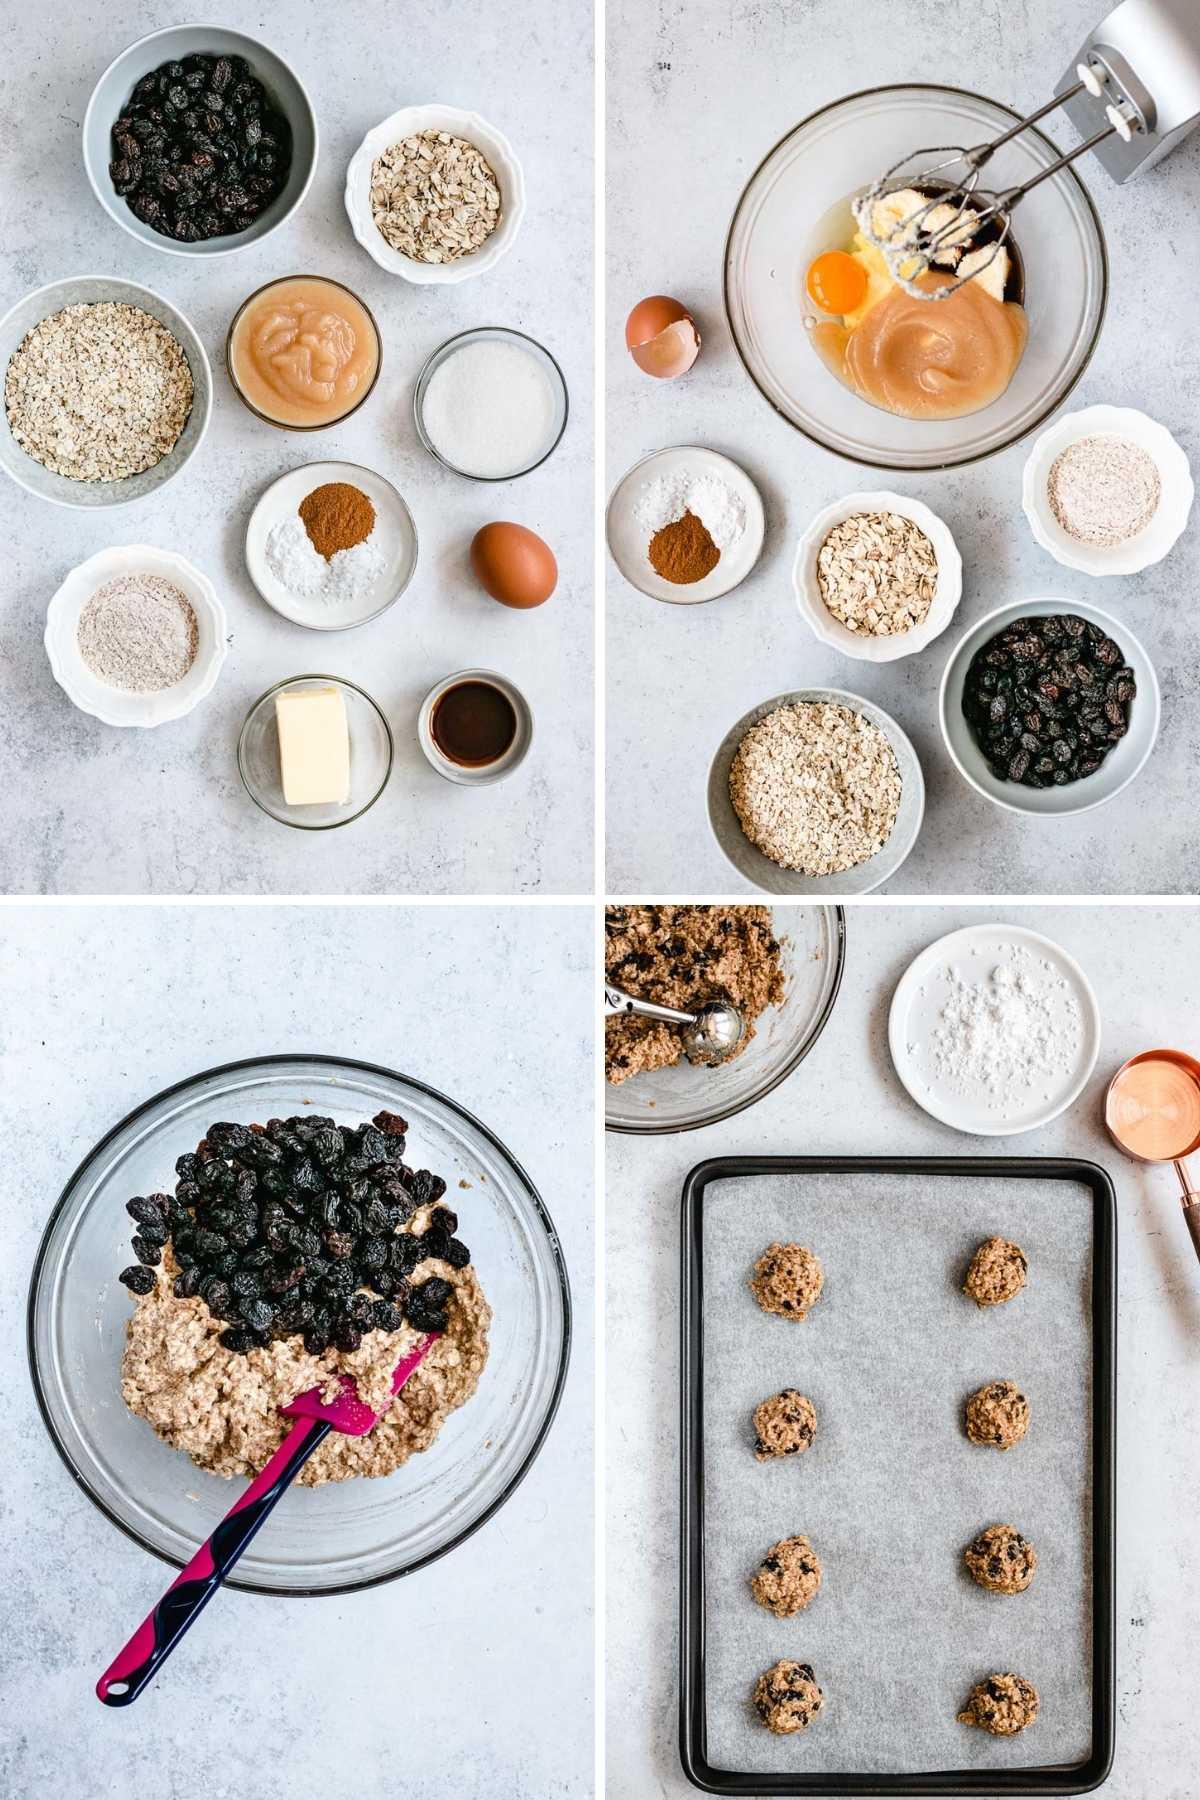 Healthy Cinnamon Oatmeal Raisin Cookies preparation collage